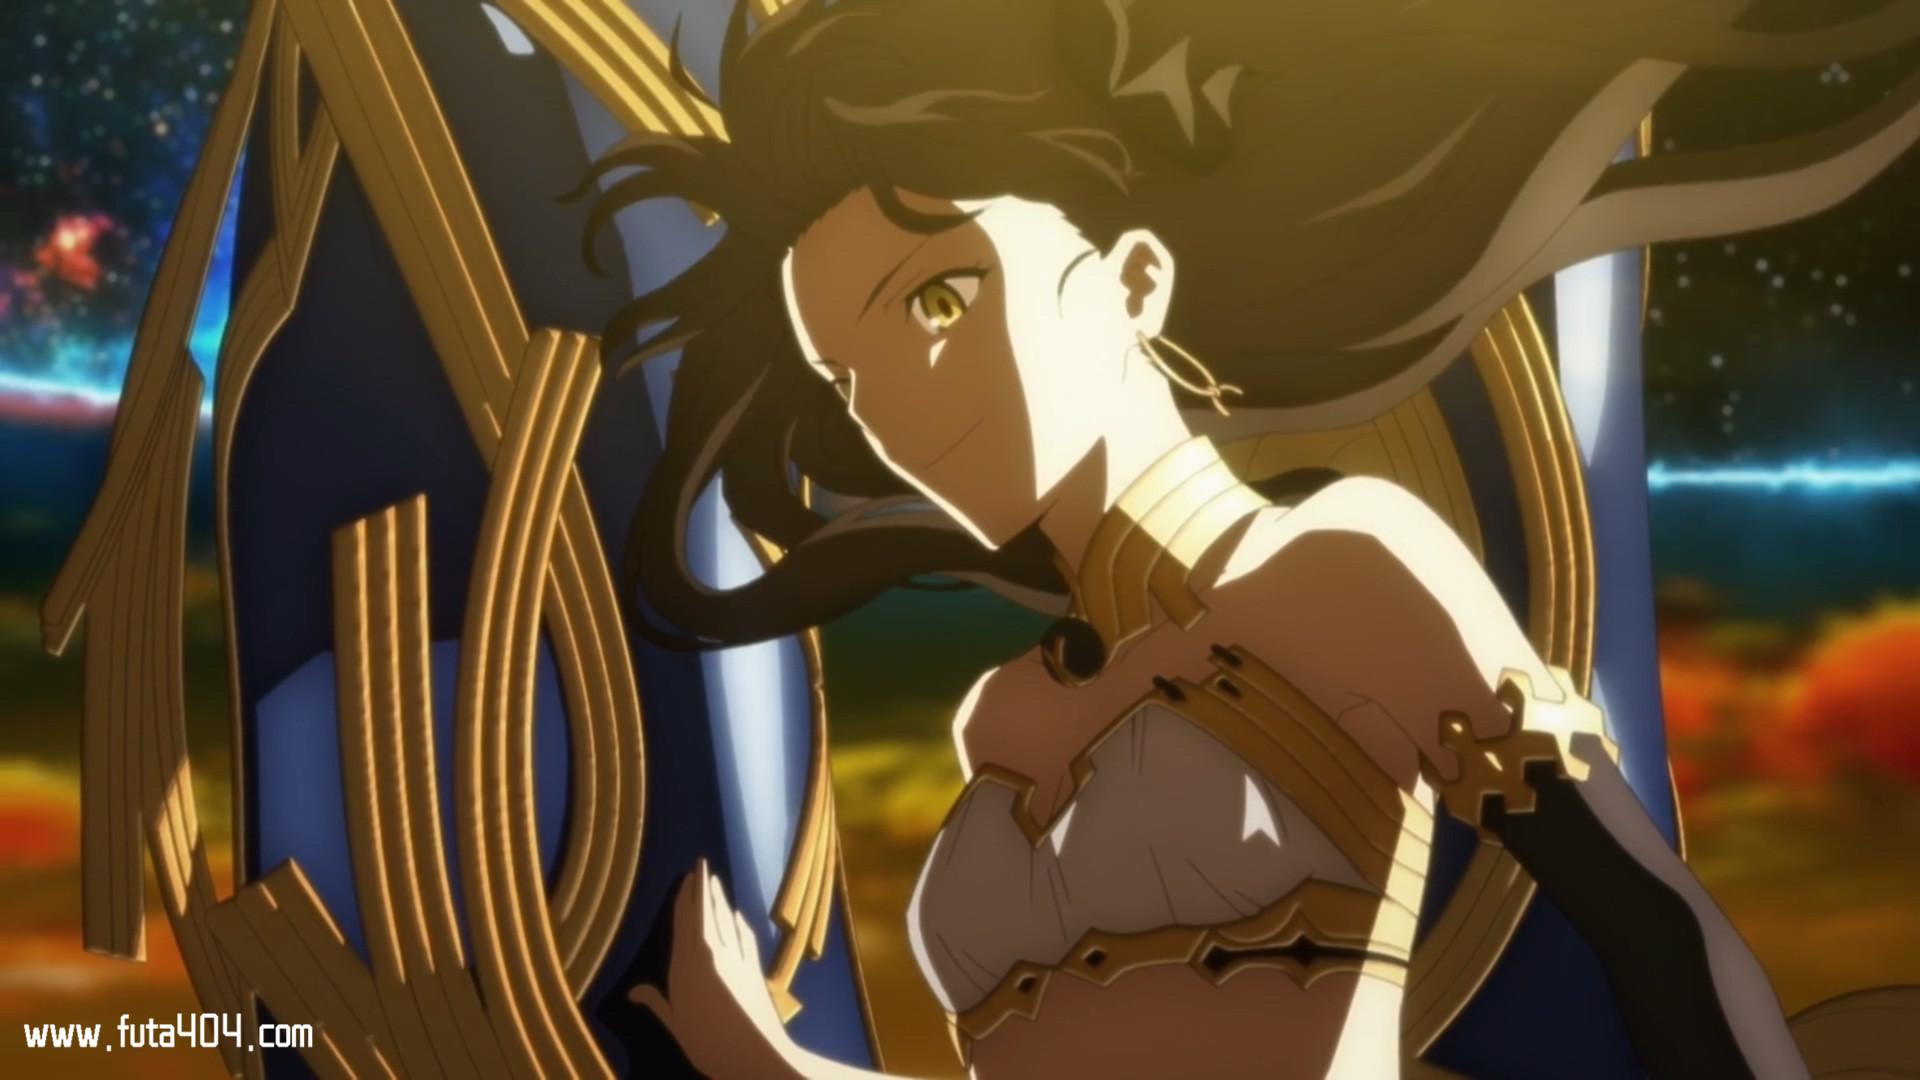 Fate Grand Order 绝对魔兽战线巴比伦尼亚 第17话 Fate Grand Order 动画在线 第1张